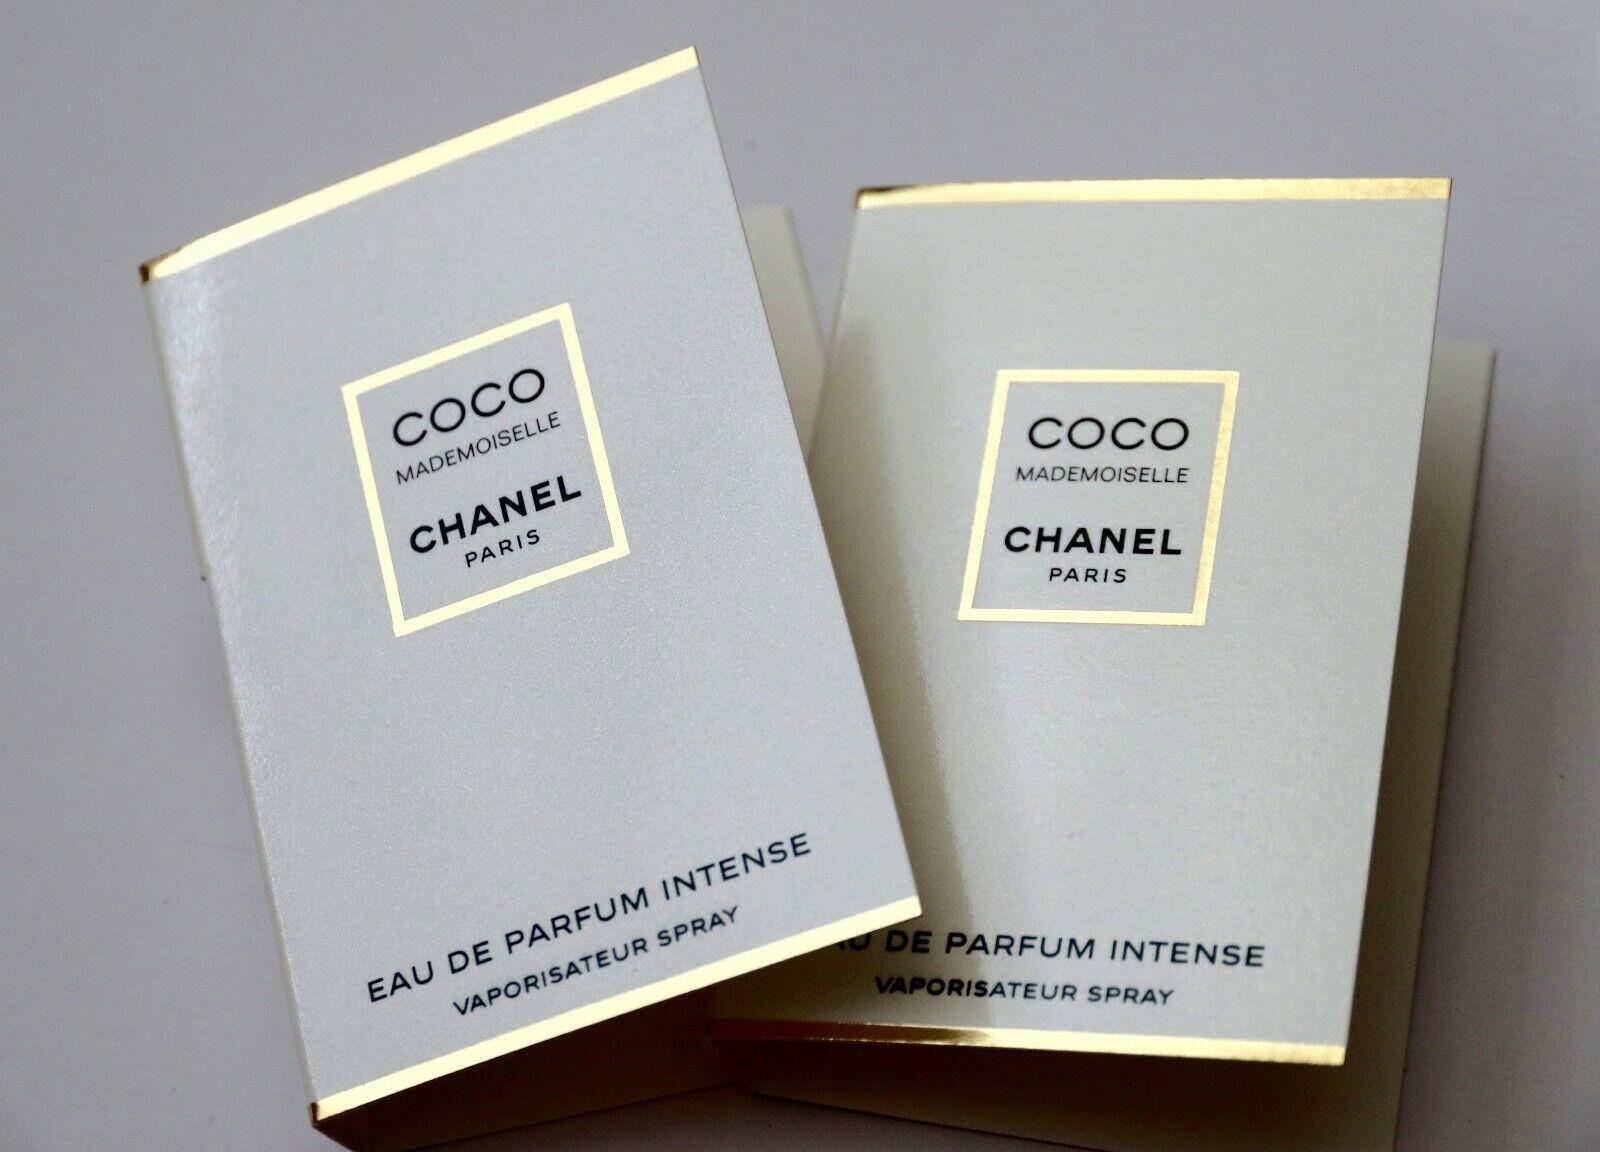 2 x Chanel Coco Mademoiselle Eau de Parfum Intense Samples Spray EDP Perfume Lot